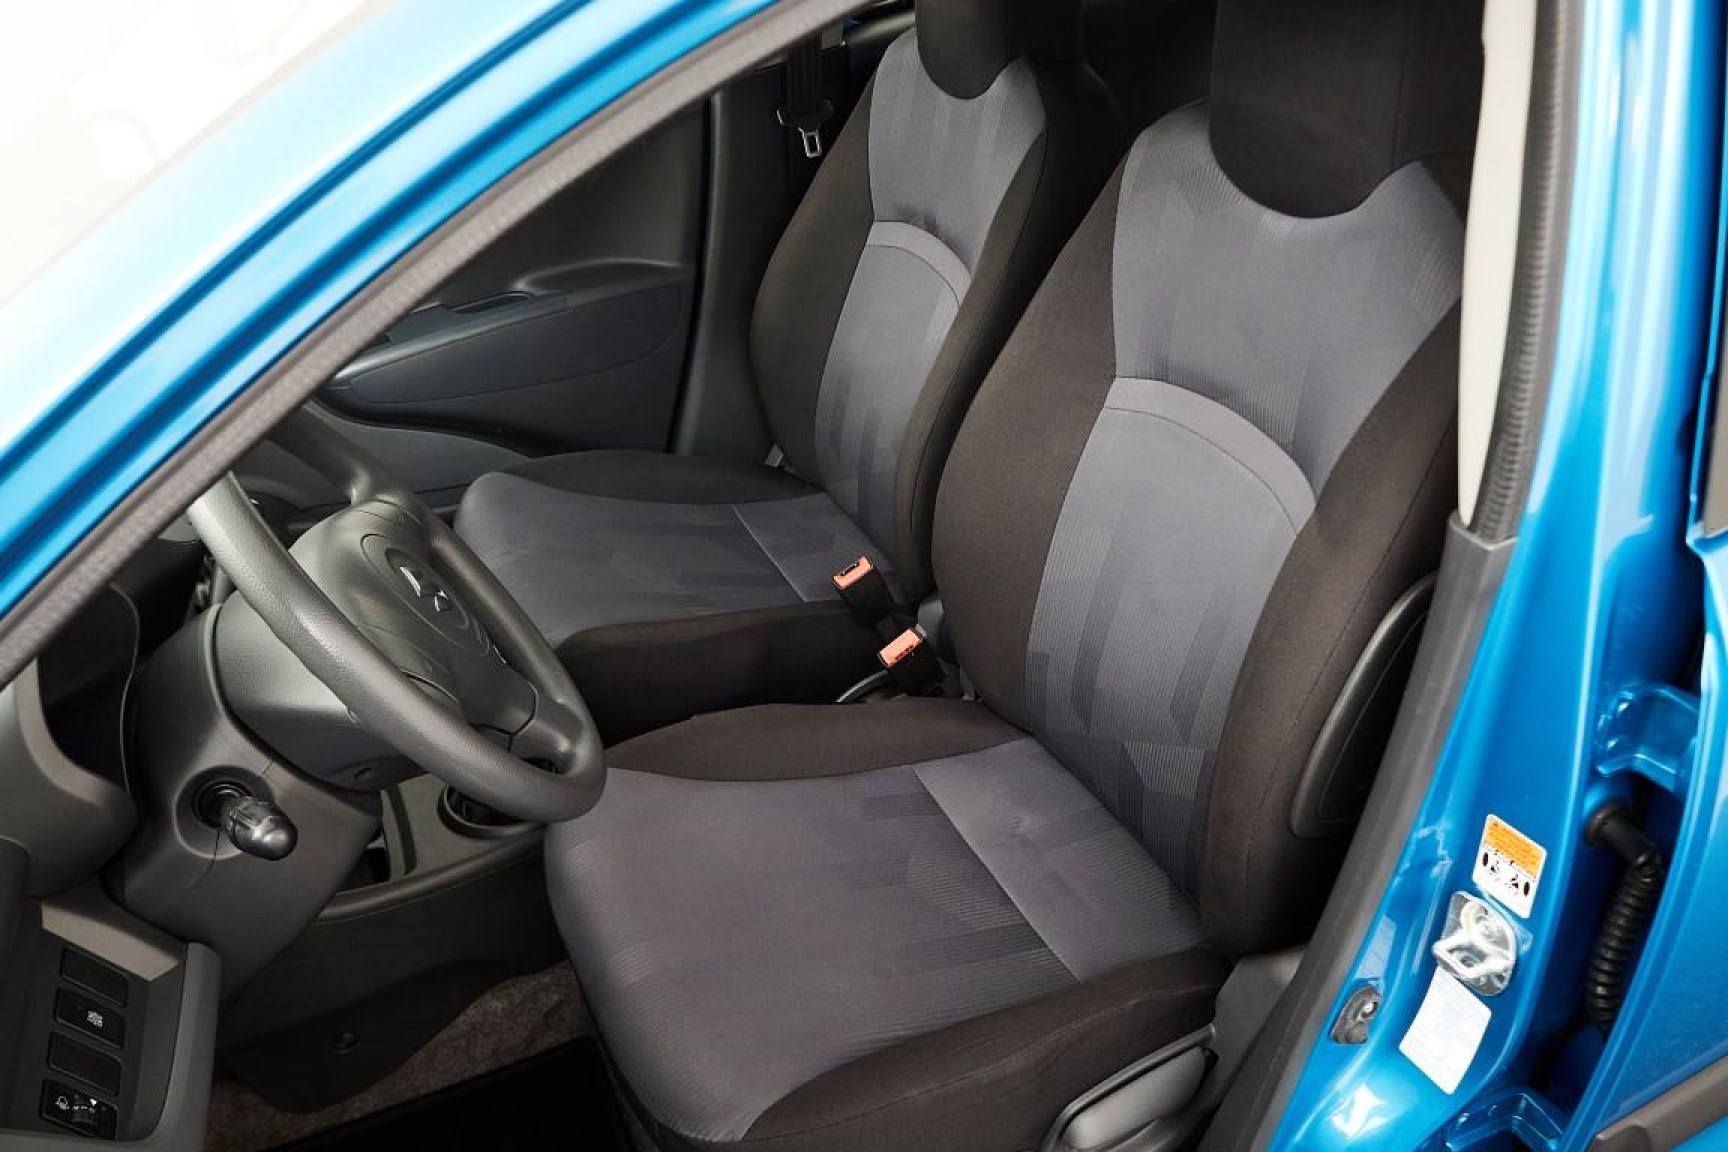 Suzuki-Alto-10